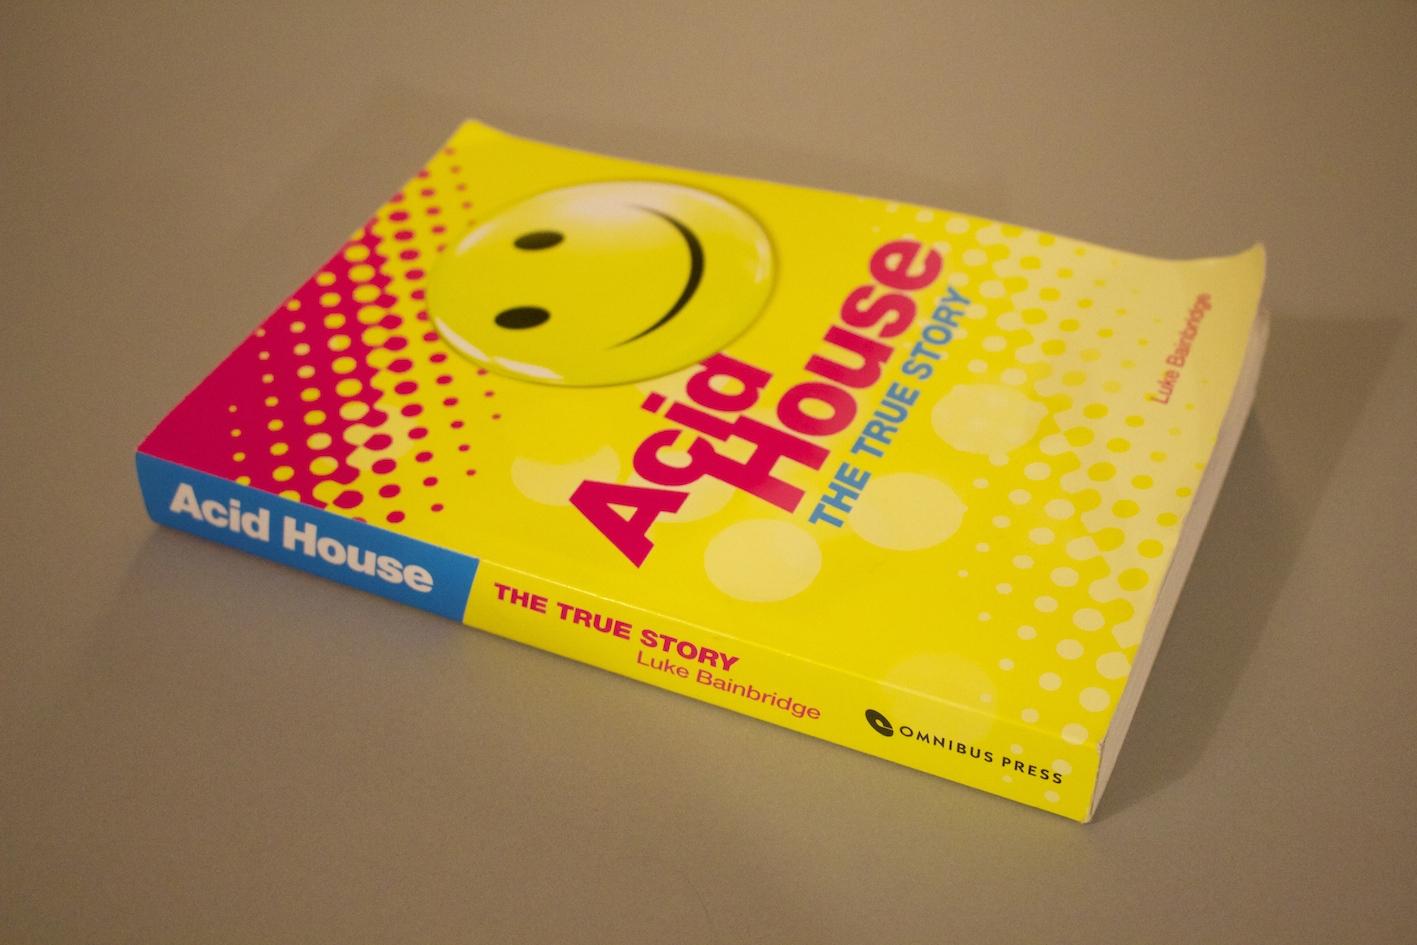 Acid House, The True Story, Luke Bainbridge,  Omnibus Press, Review, Test Pressing